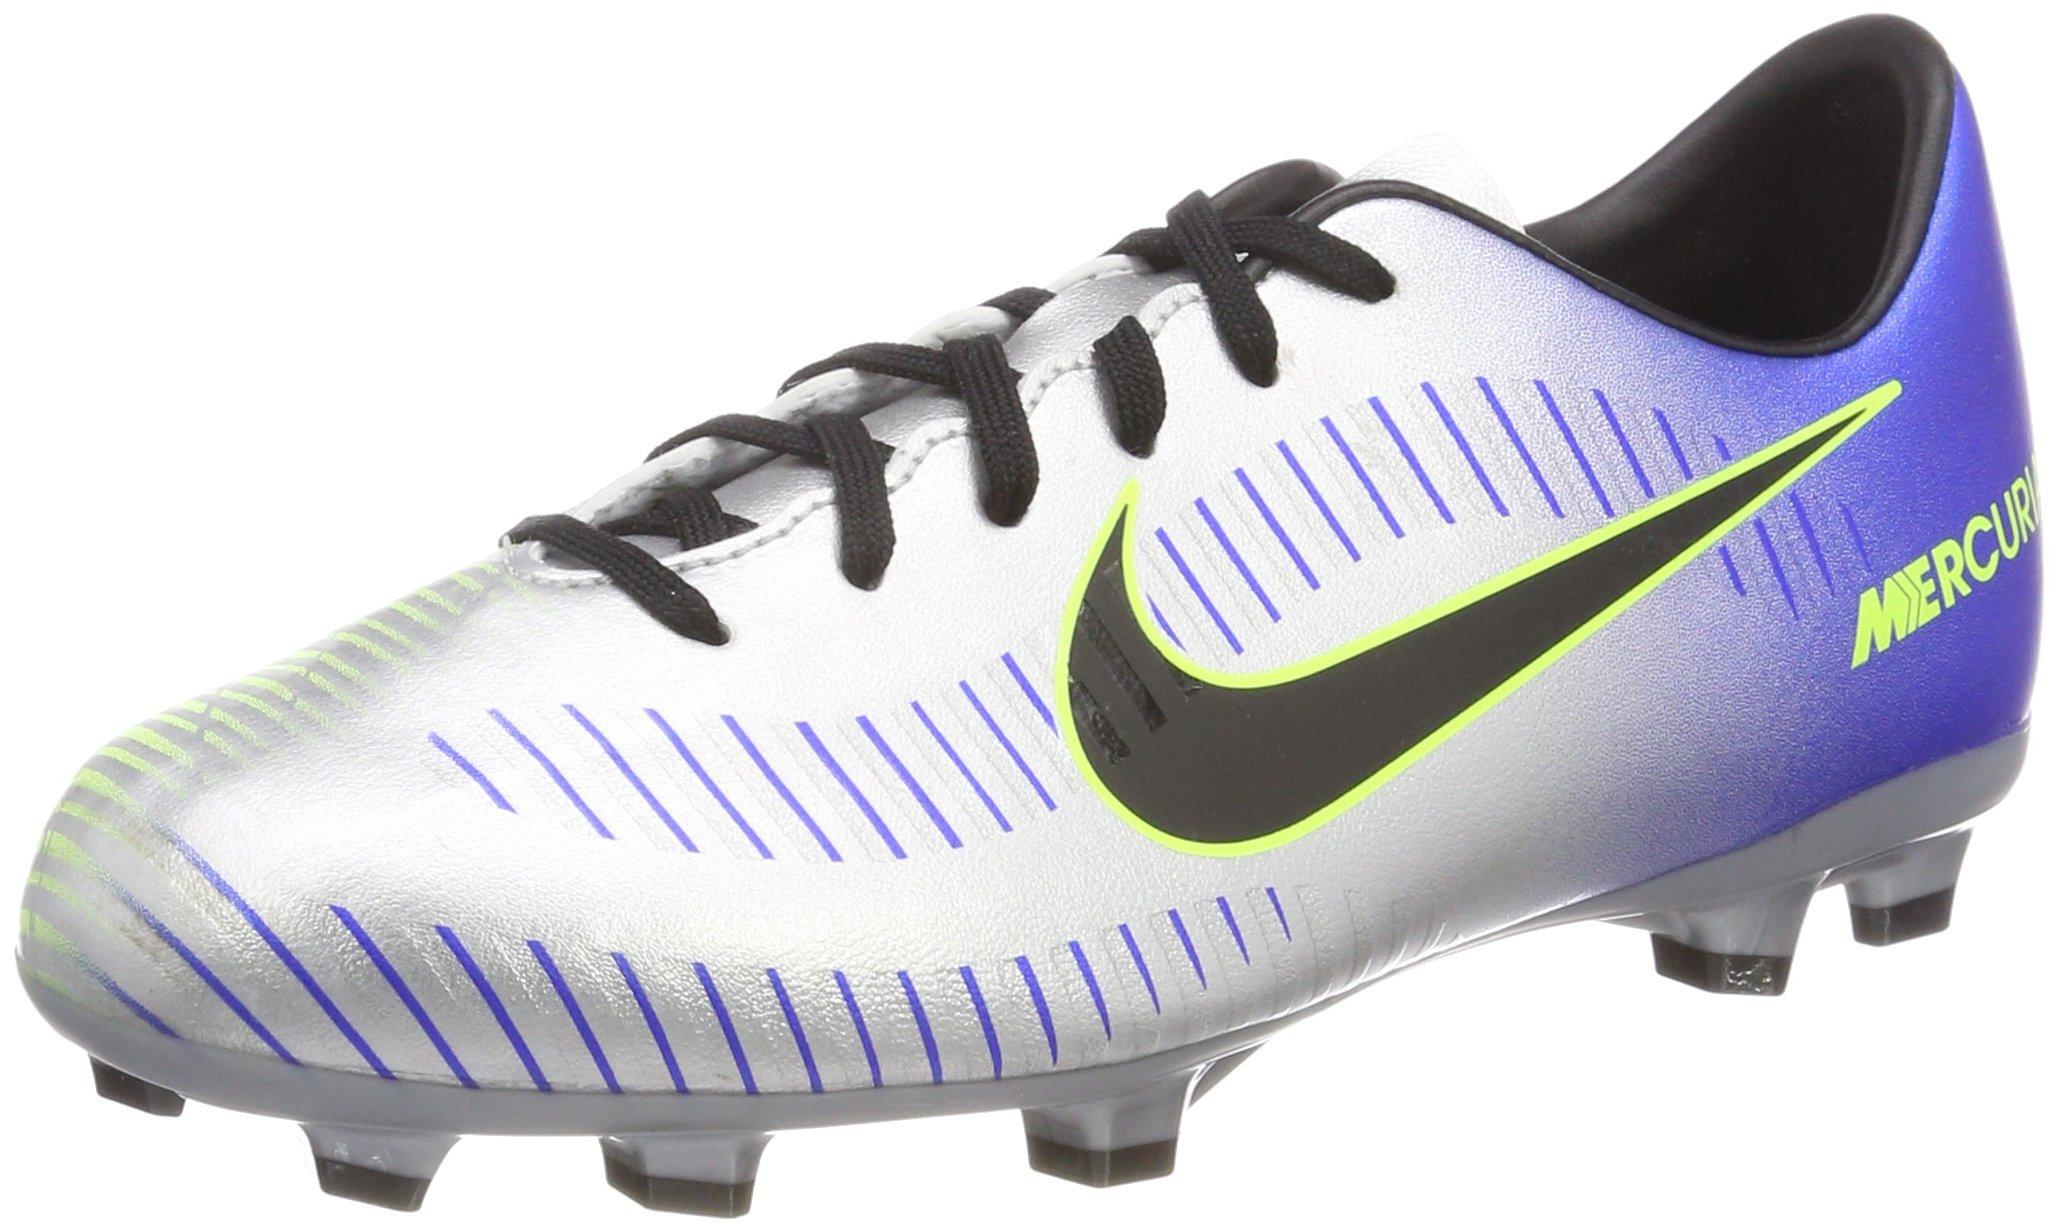 Nike Neymar JR Mercurial Victory VI Youth FG Soccer Cleats- Racer Blue Size: 4Y